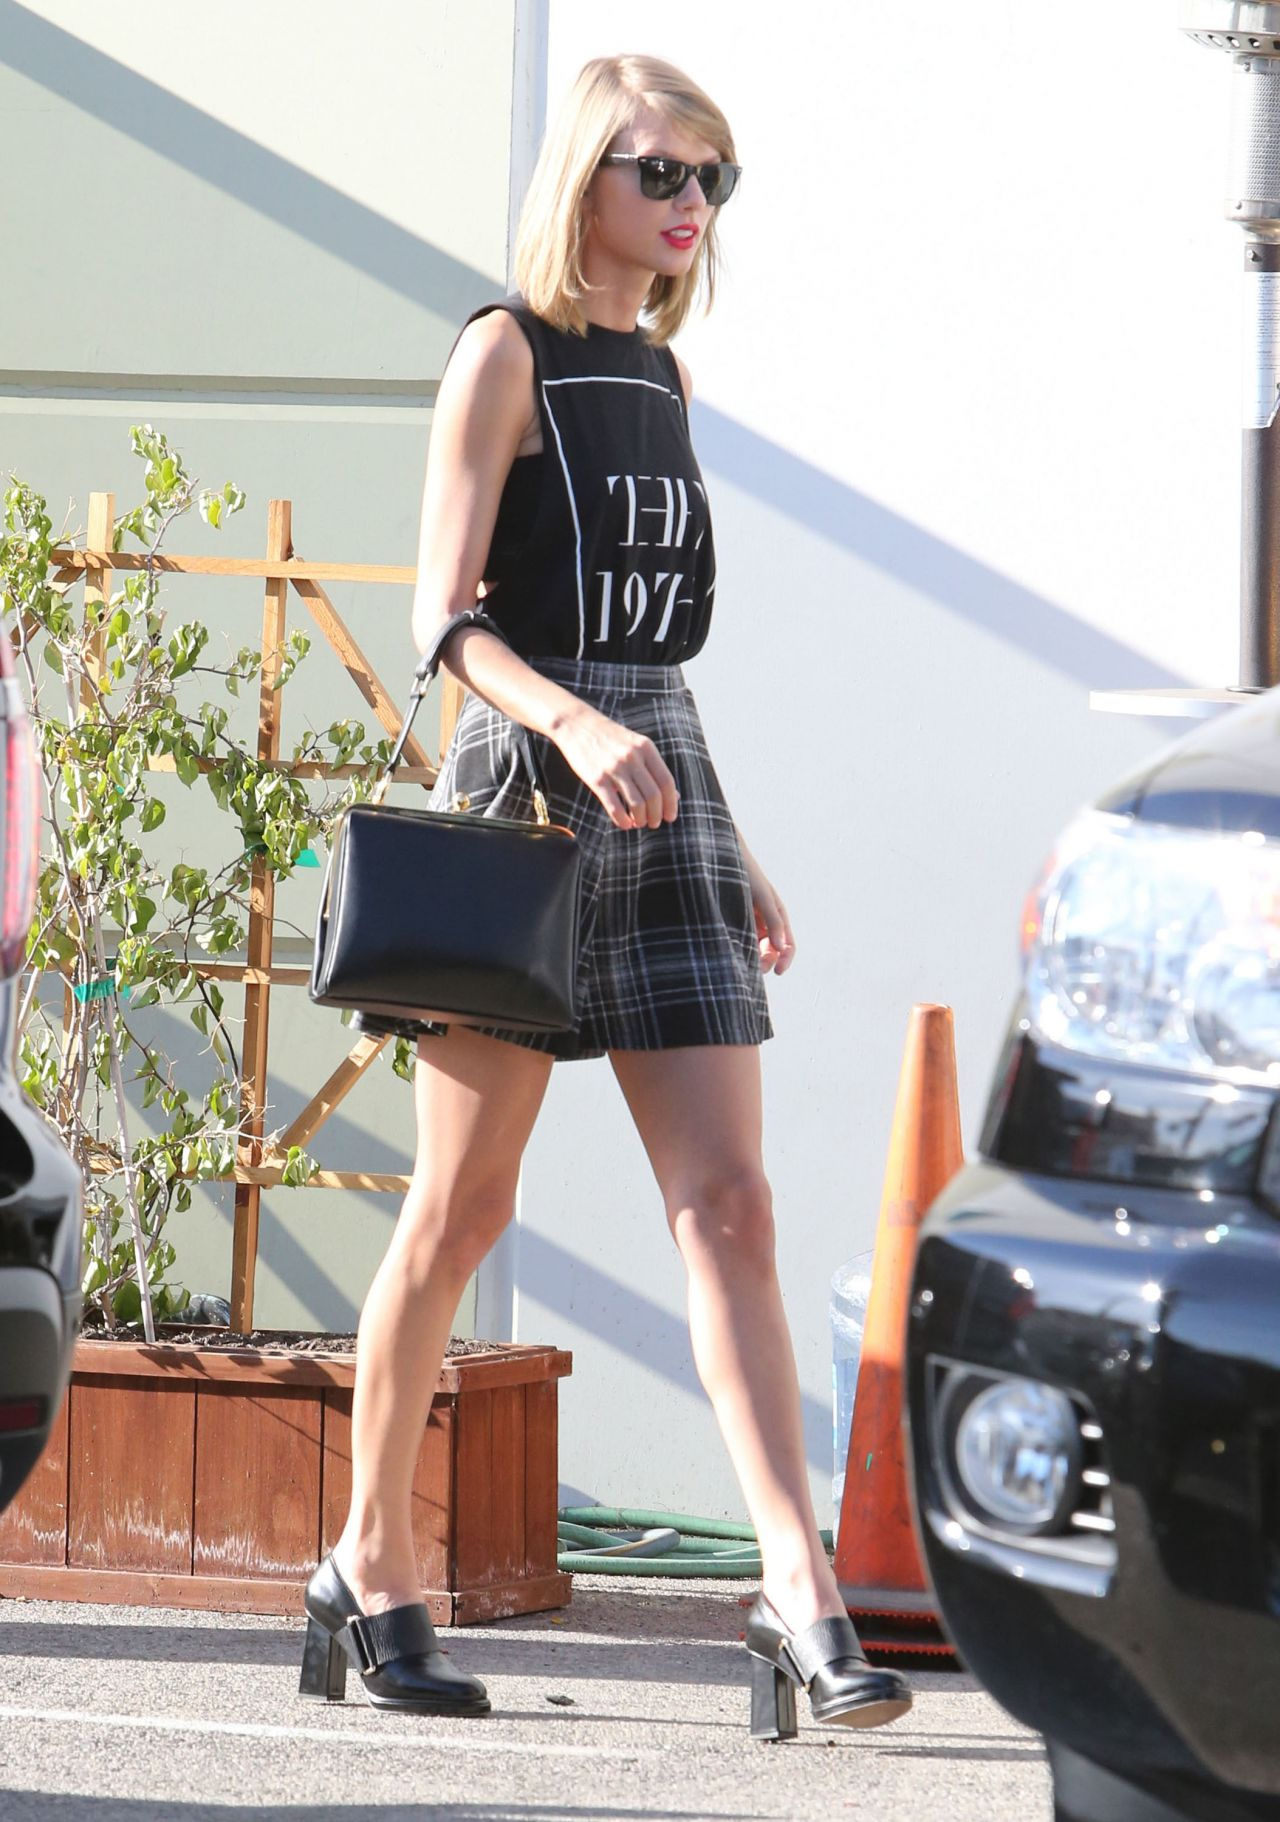 Taylor Swift Leggy in Mini Skirt  Leaving a Studio in Los Angeles  November 2014